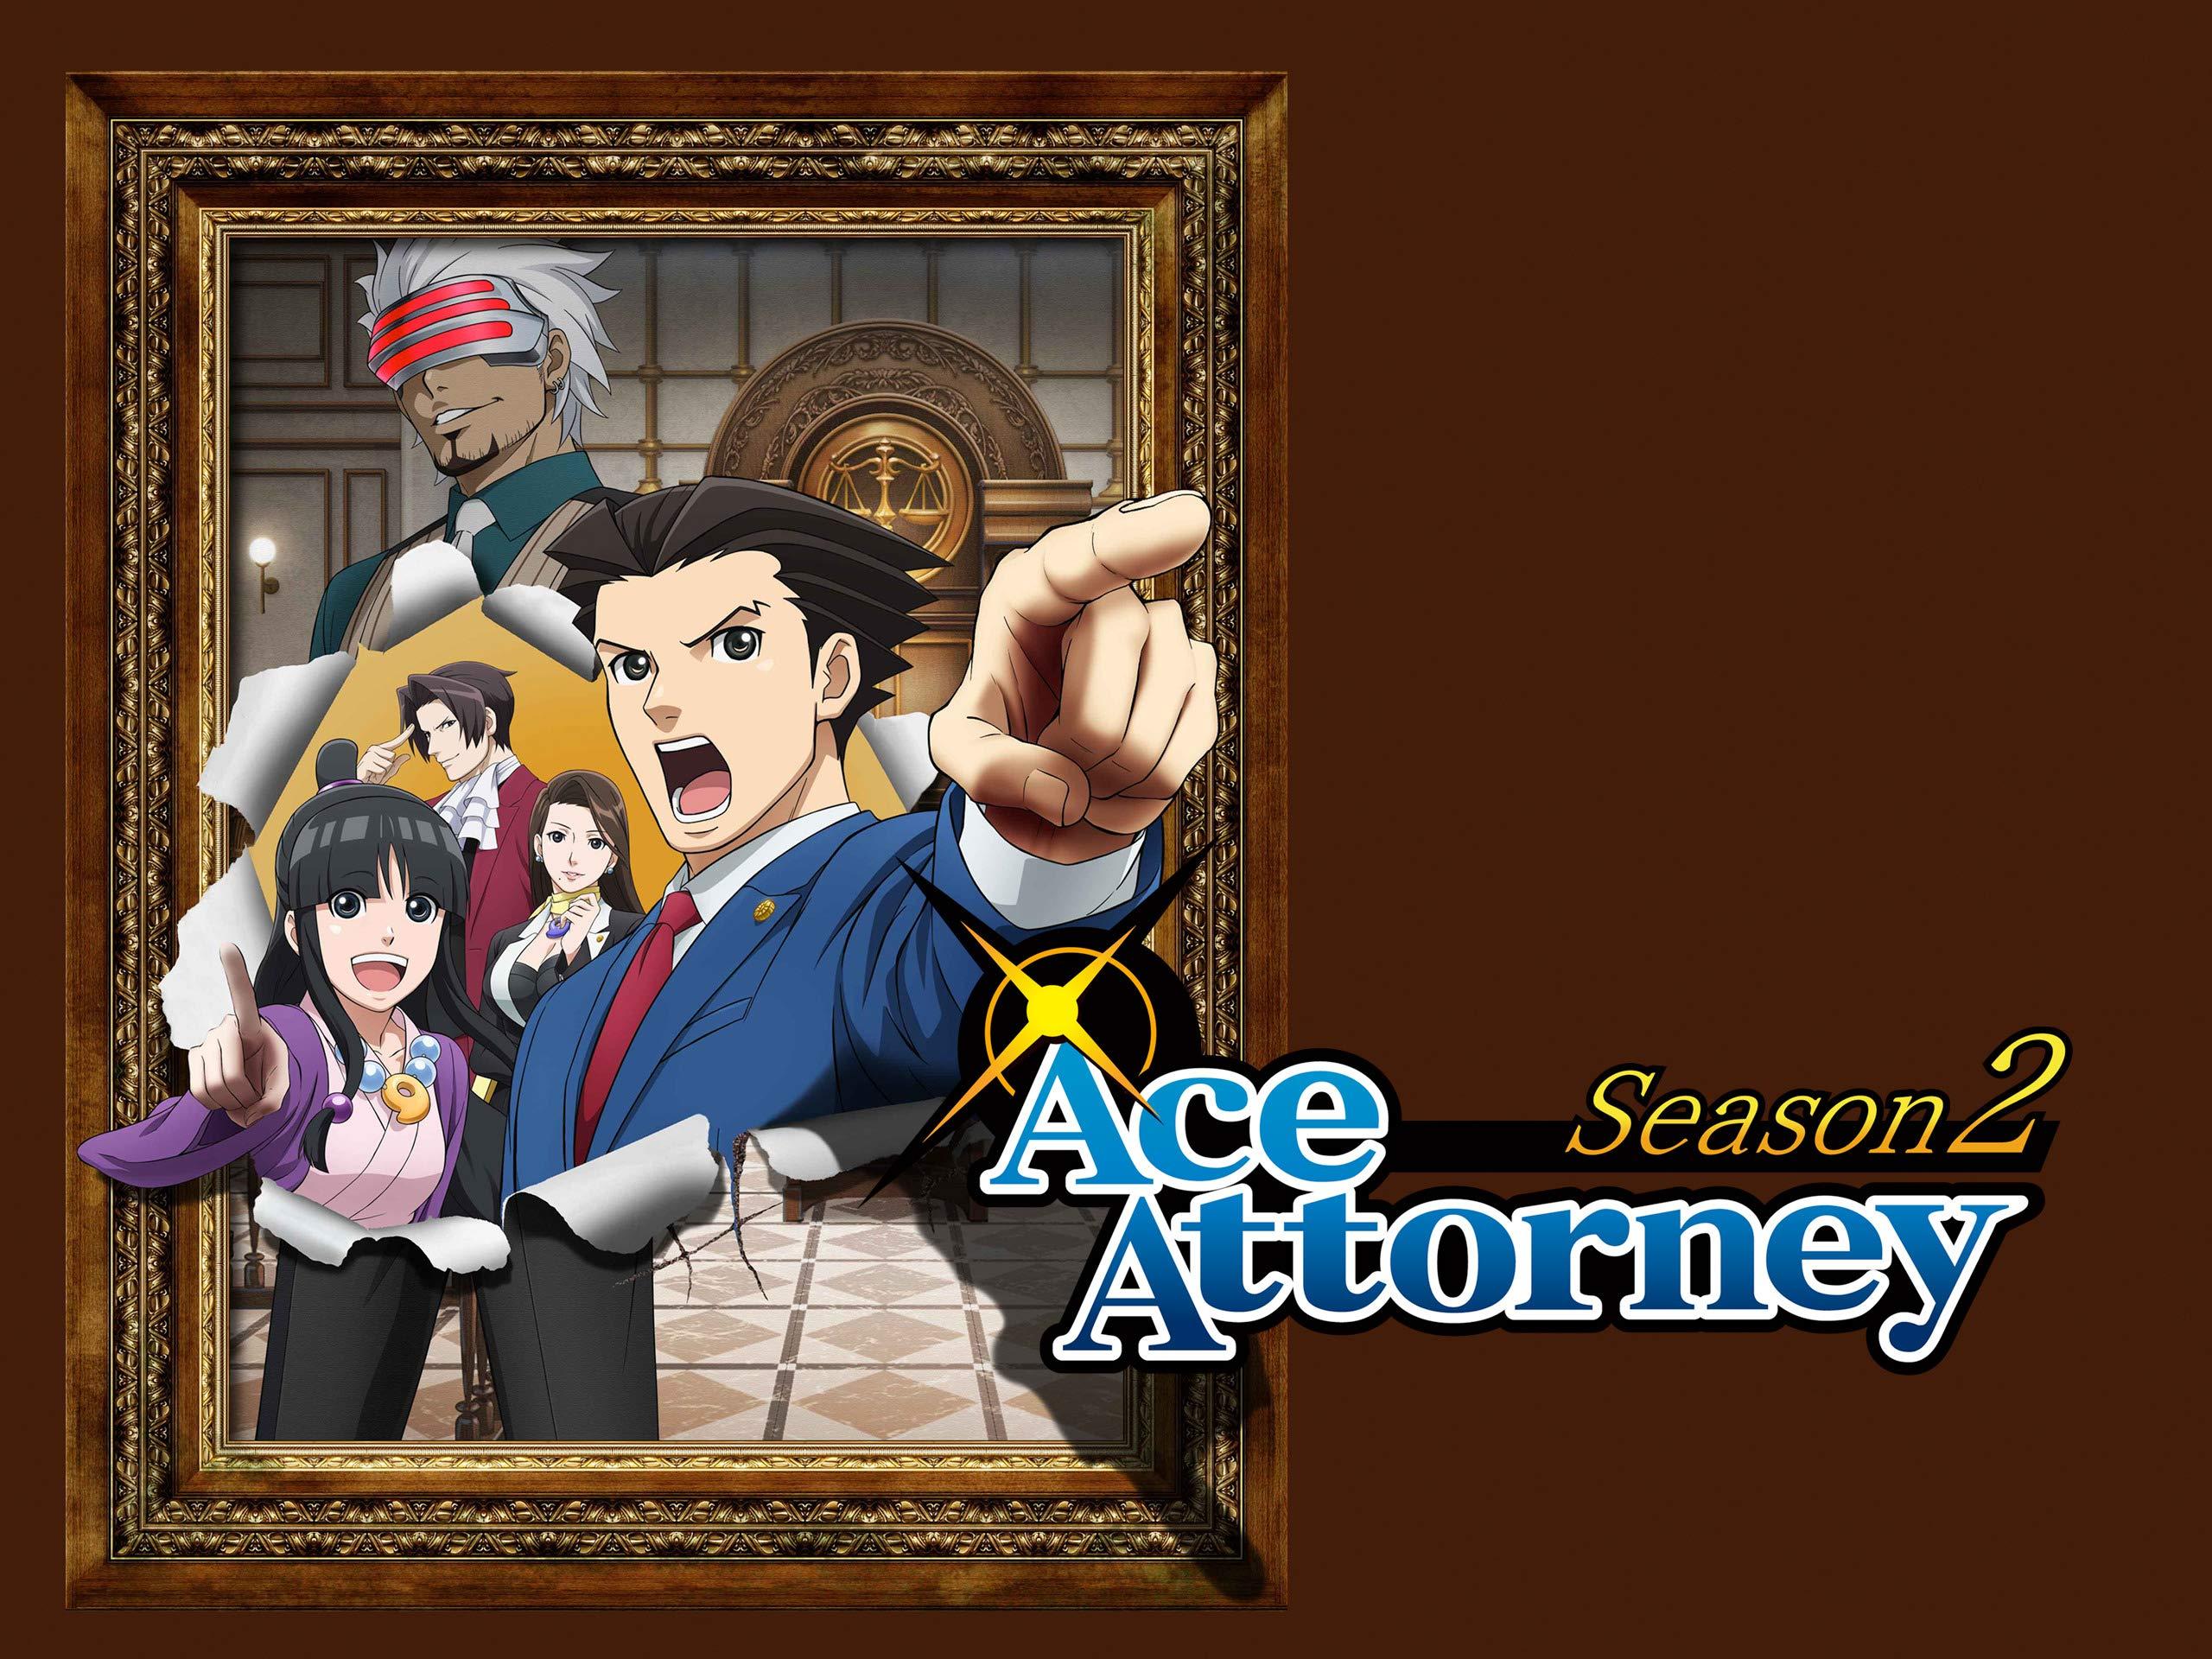 ace attorney godot face